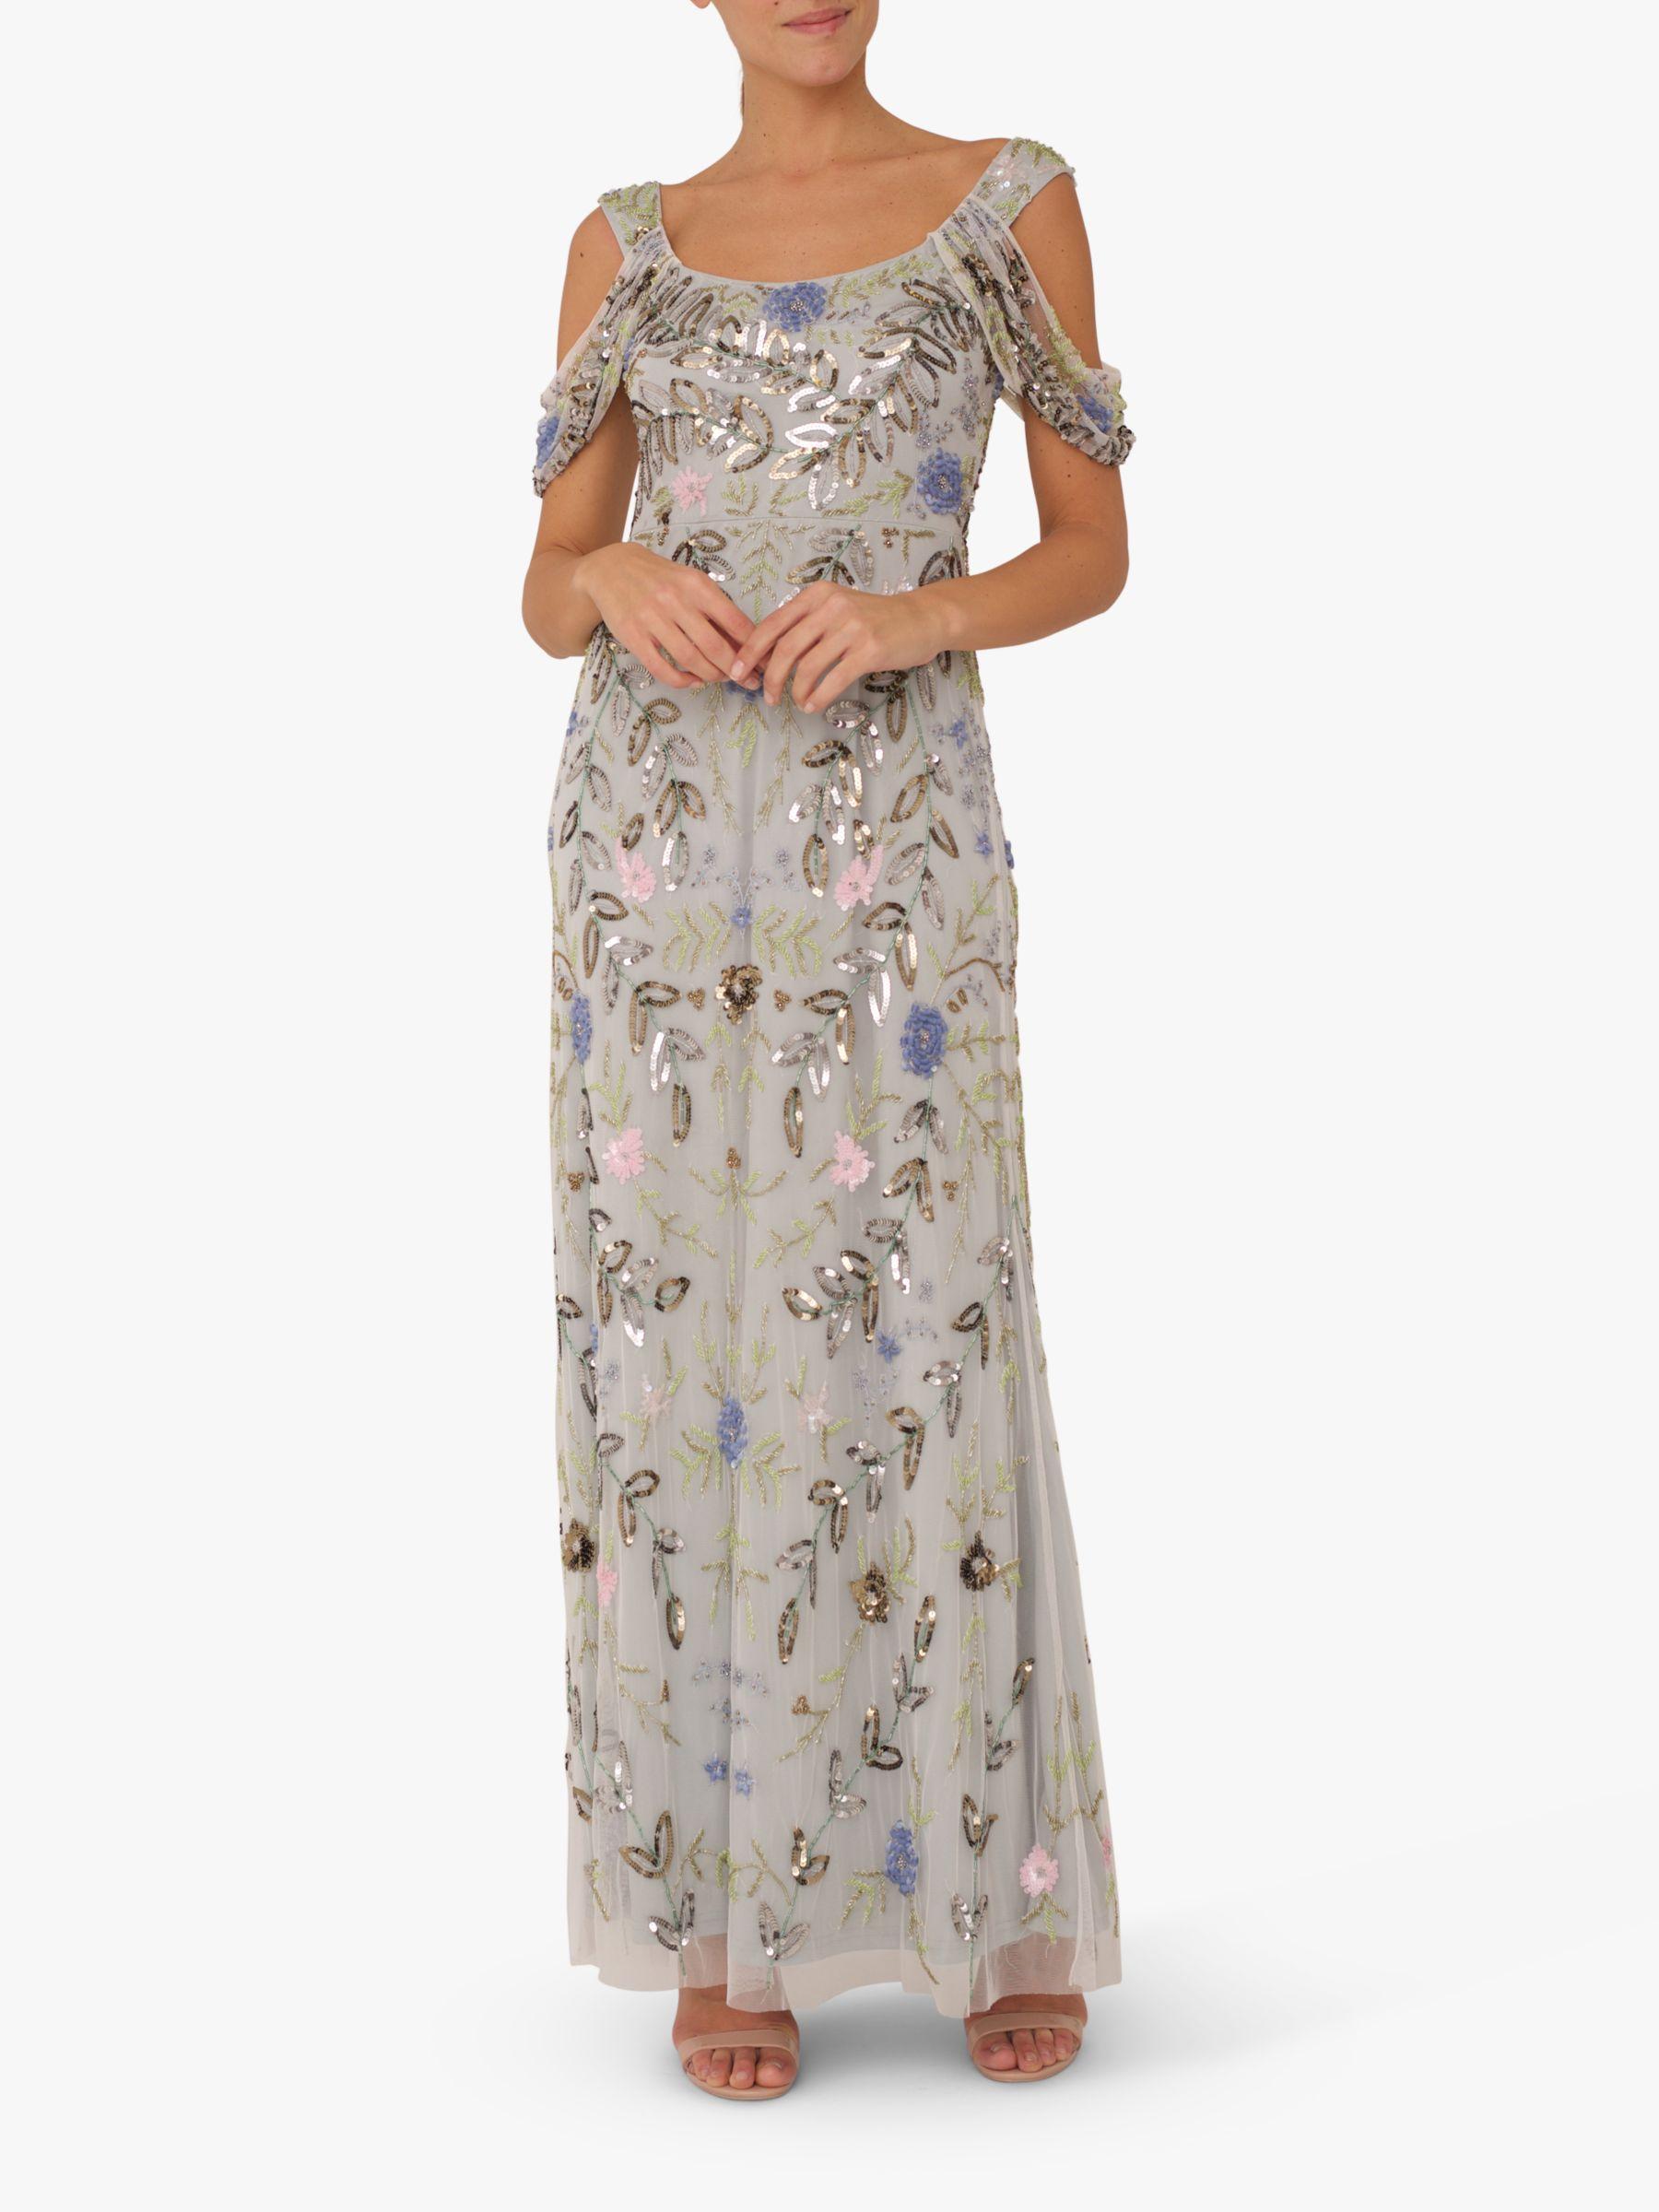 RAISHMA Raishma Cold Shoulder Embellished Gown, Blue